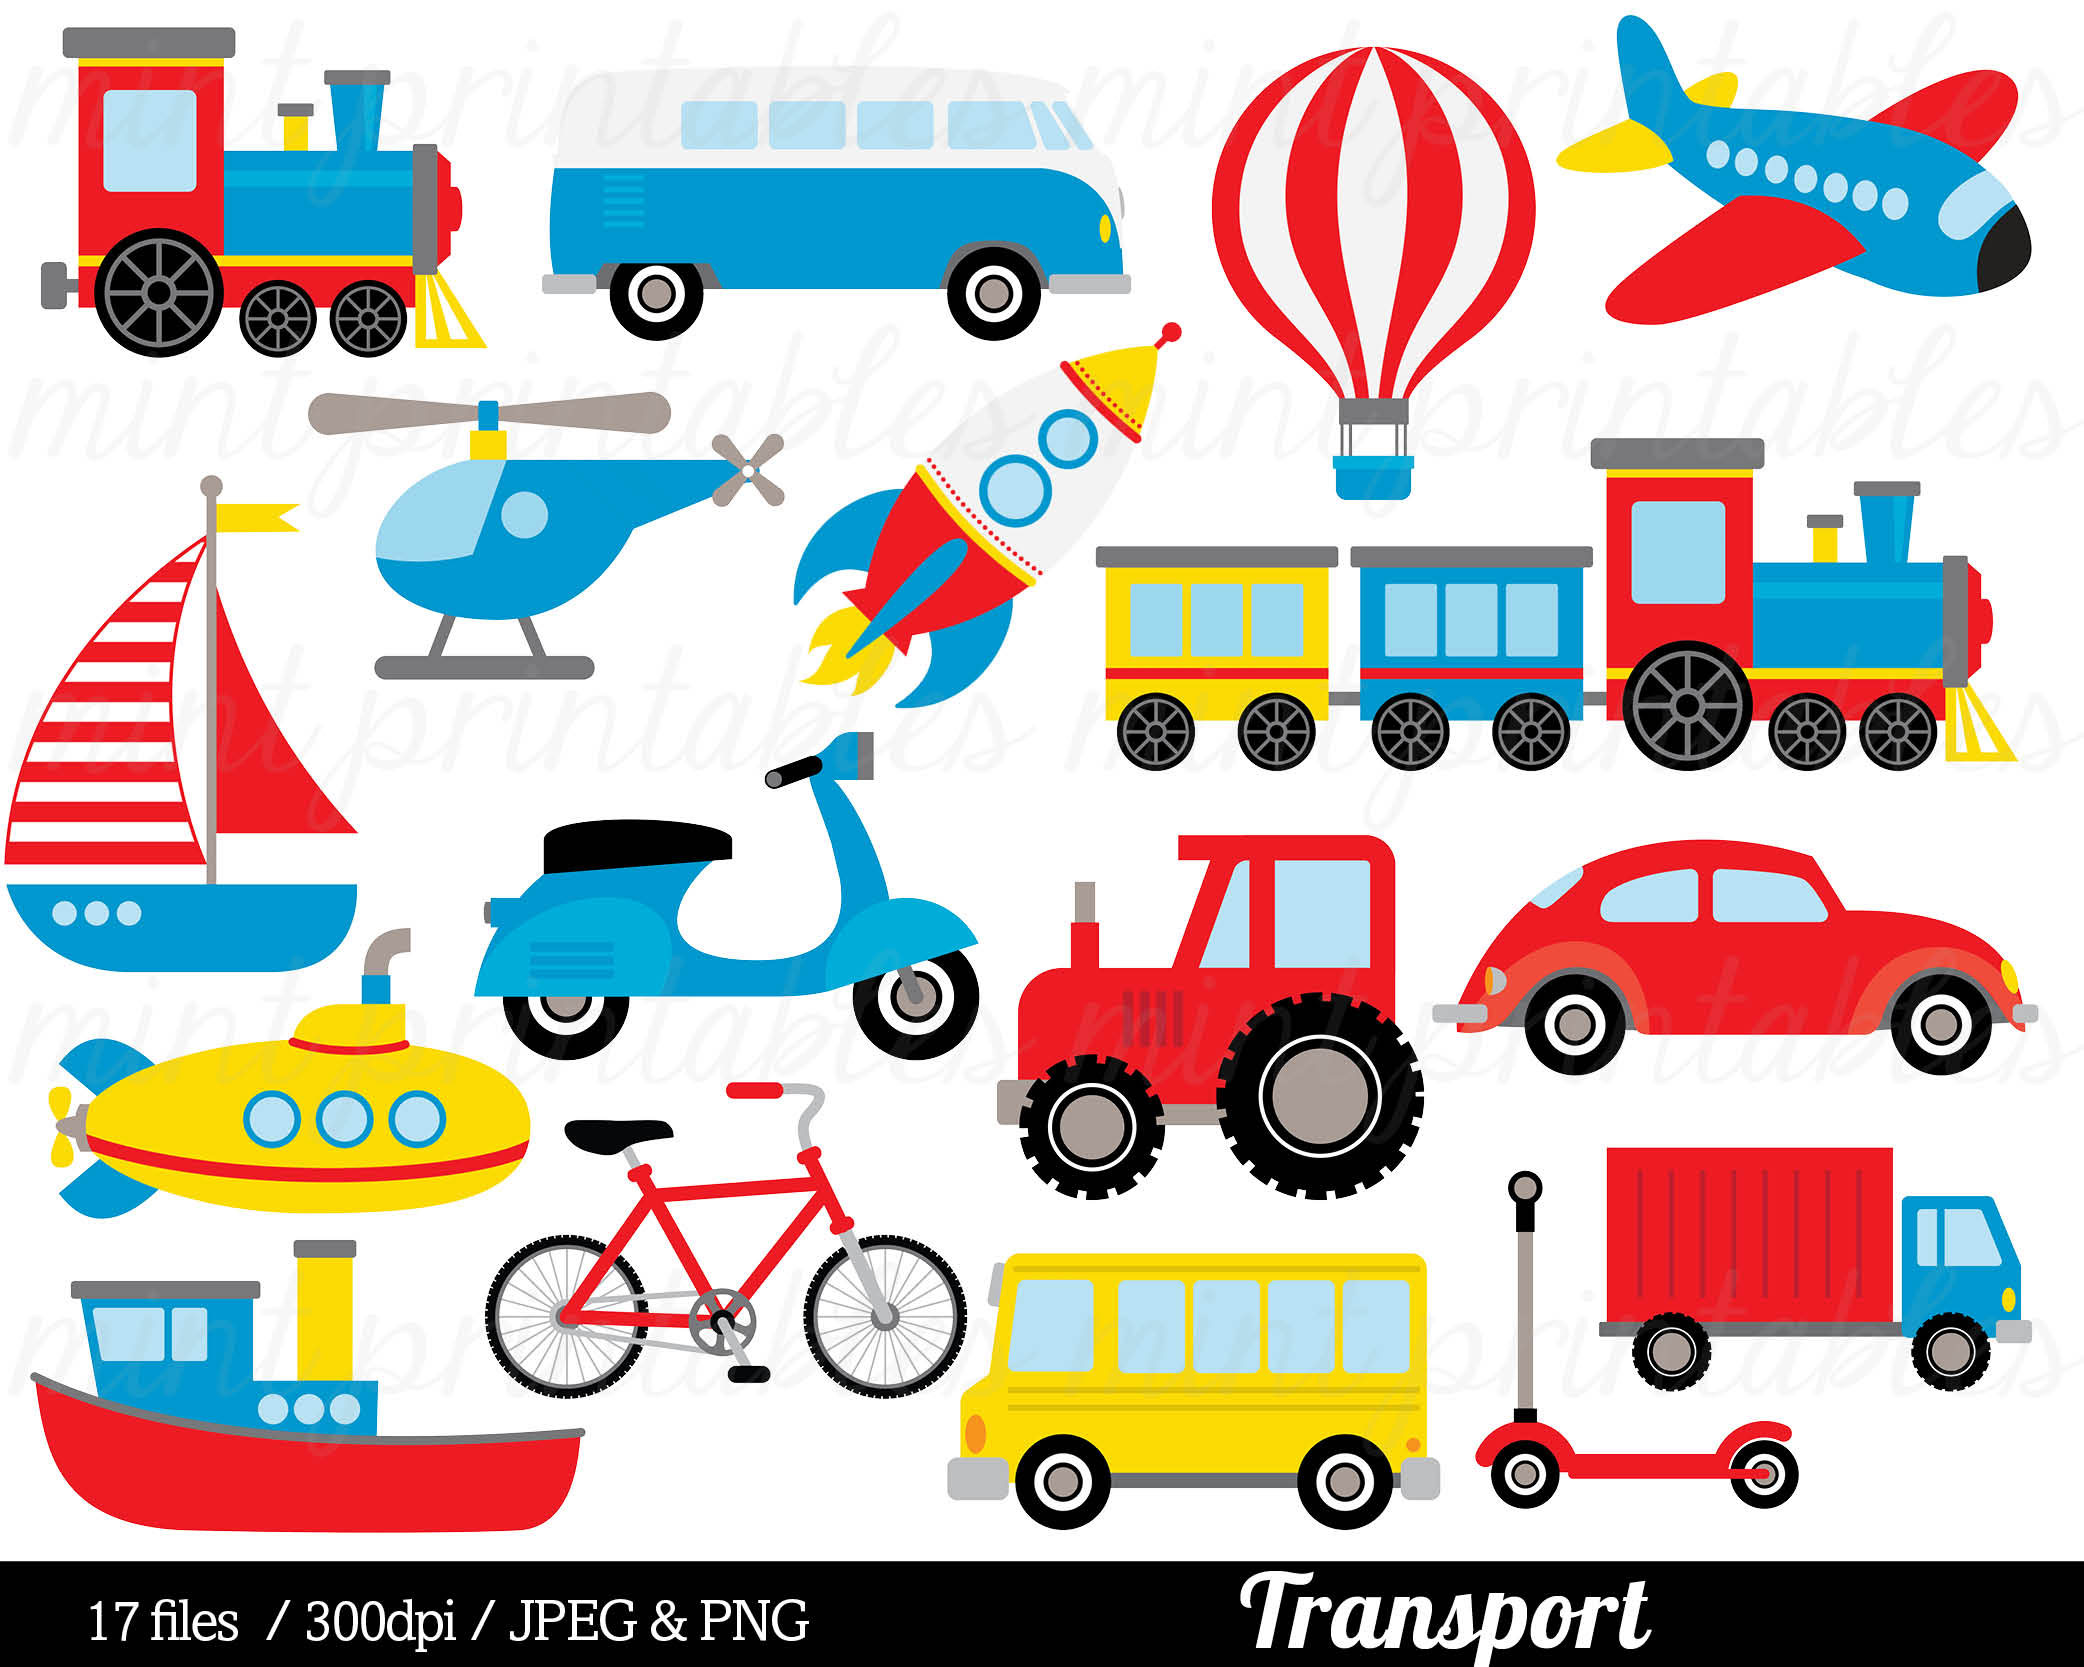 Transport Clipart Transport Clip Art, Train Car Truck Helicopter Bus Plane  Boat Submarine Rocket.